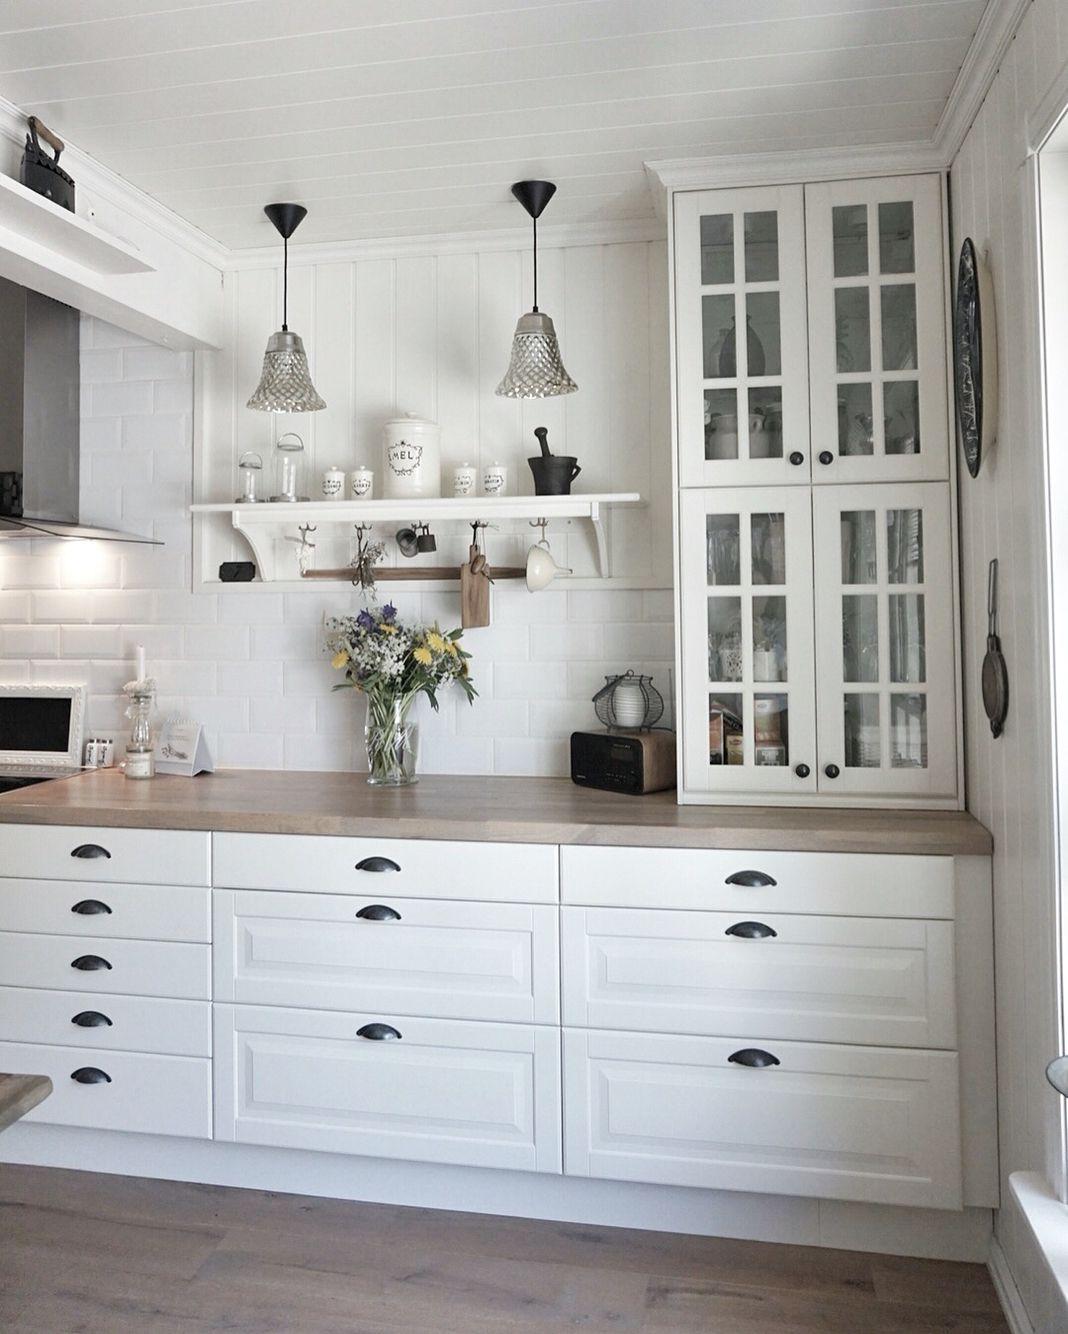 Küchenideen bauernhaus vitrinehängeschränke stapeln ikea kitchen  behindabluedoor